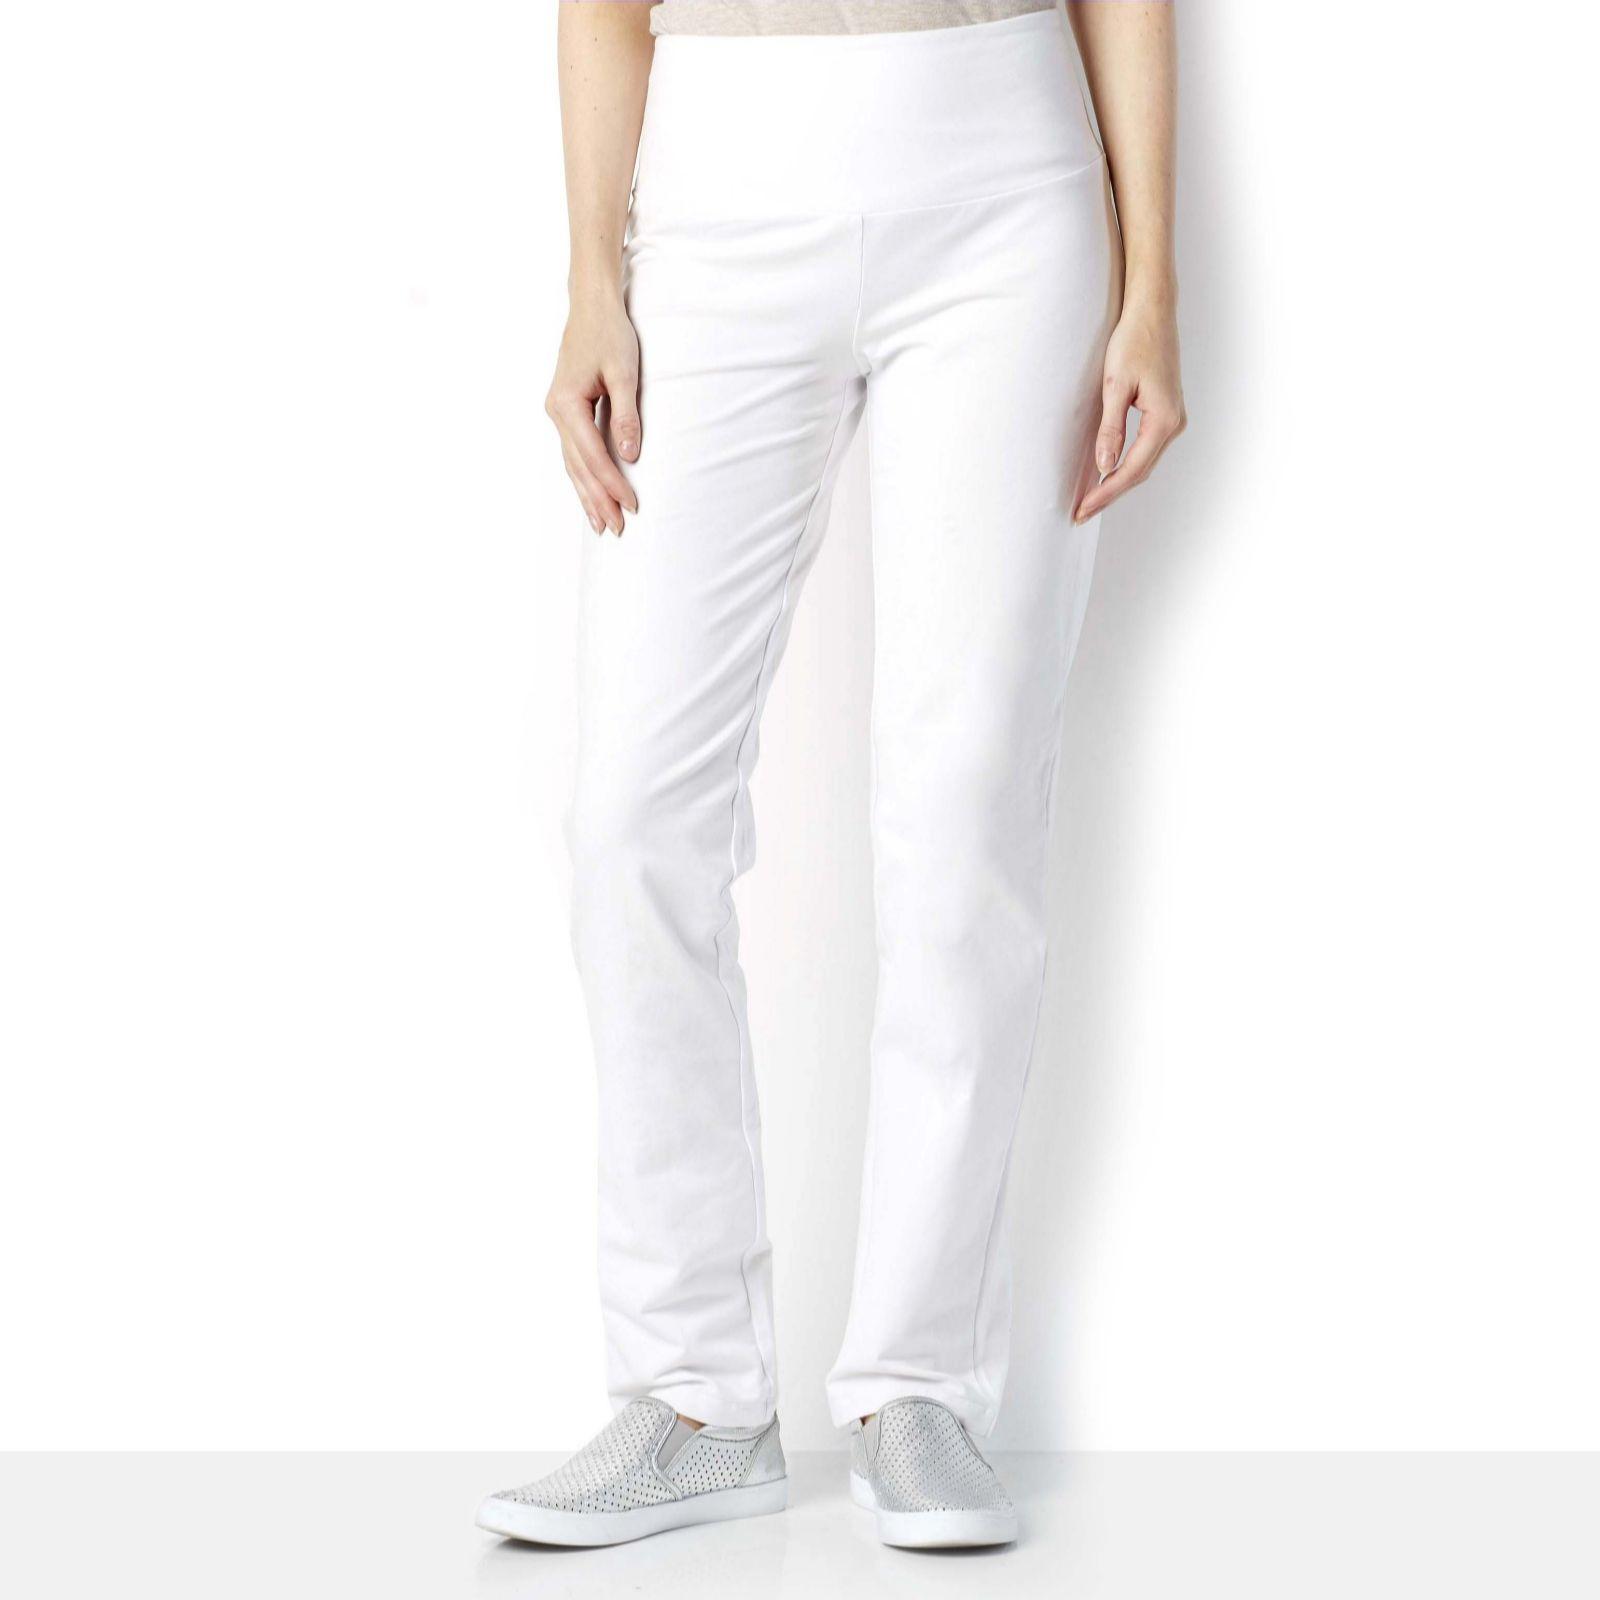 165523.001 attitudes by renee qvc uk,Renee C Womens Clothing